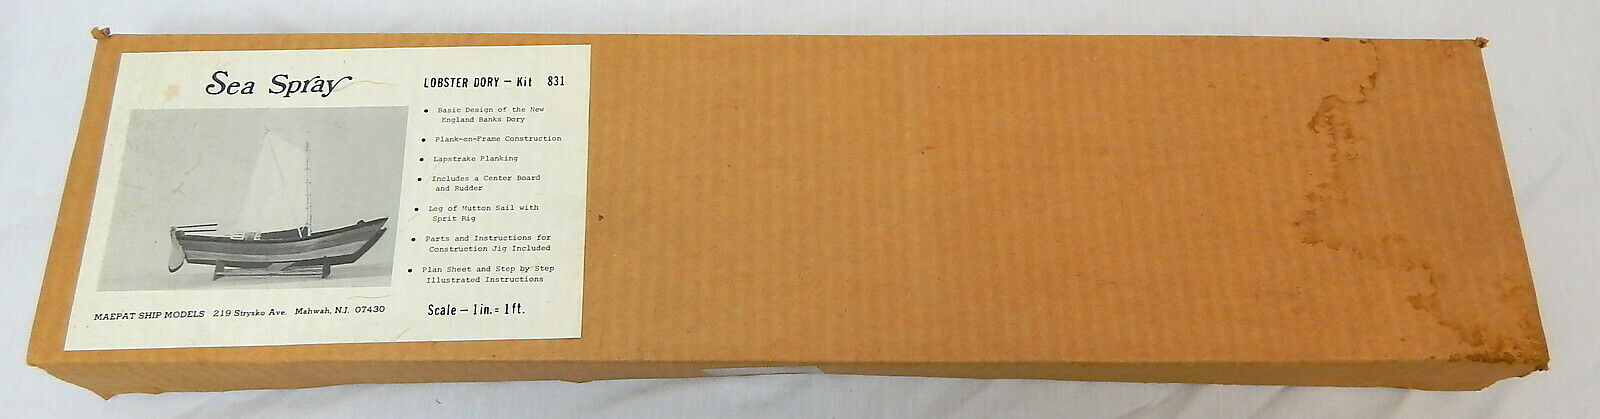 Modelo mapet, rociado de agua de mar de de de langosta Dory Wood. 857